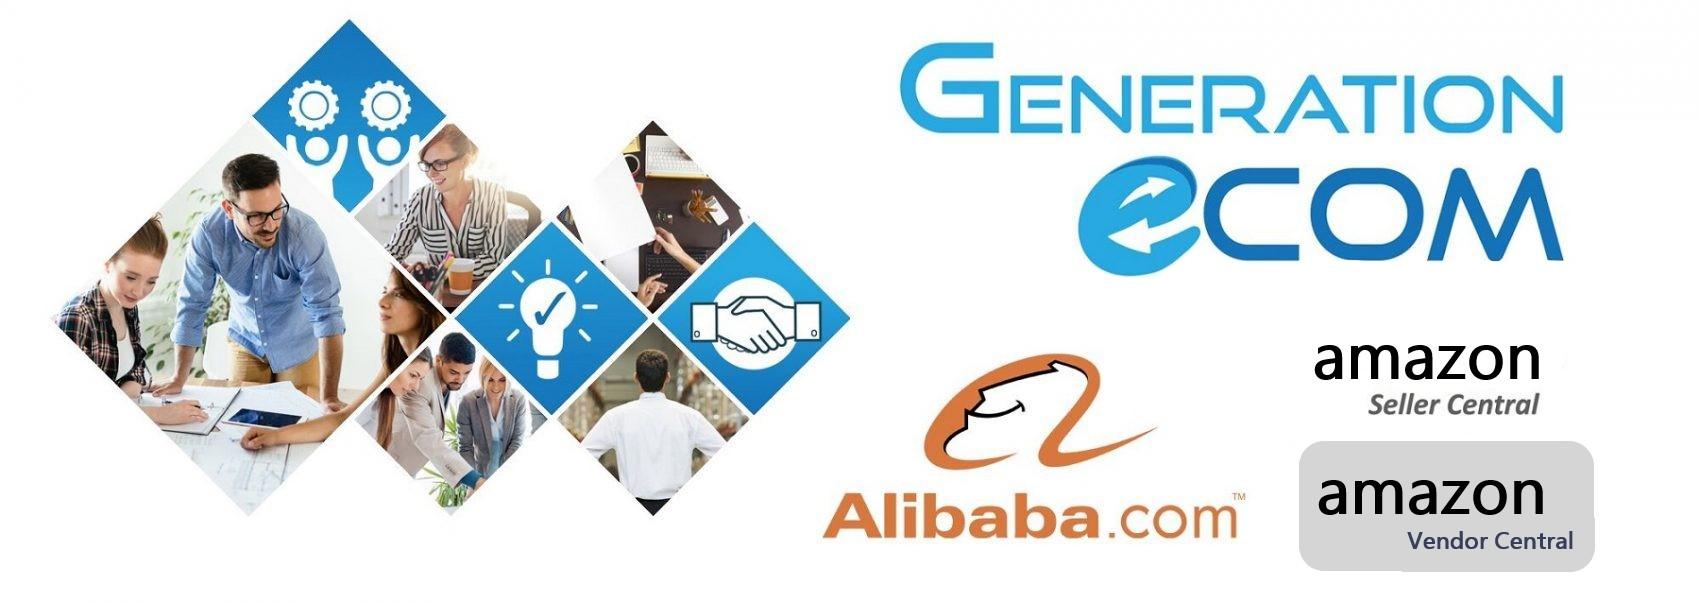 GenerationEcom Banner